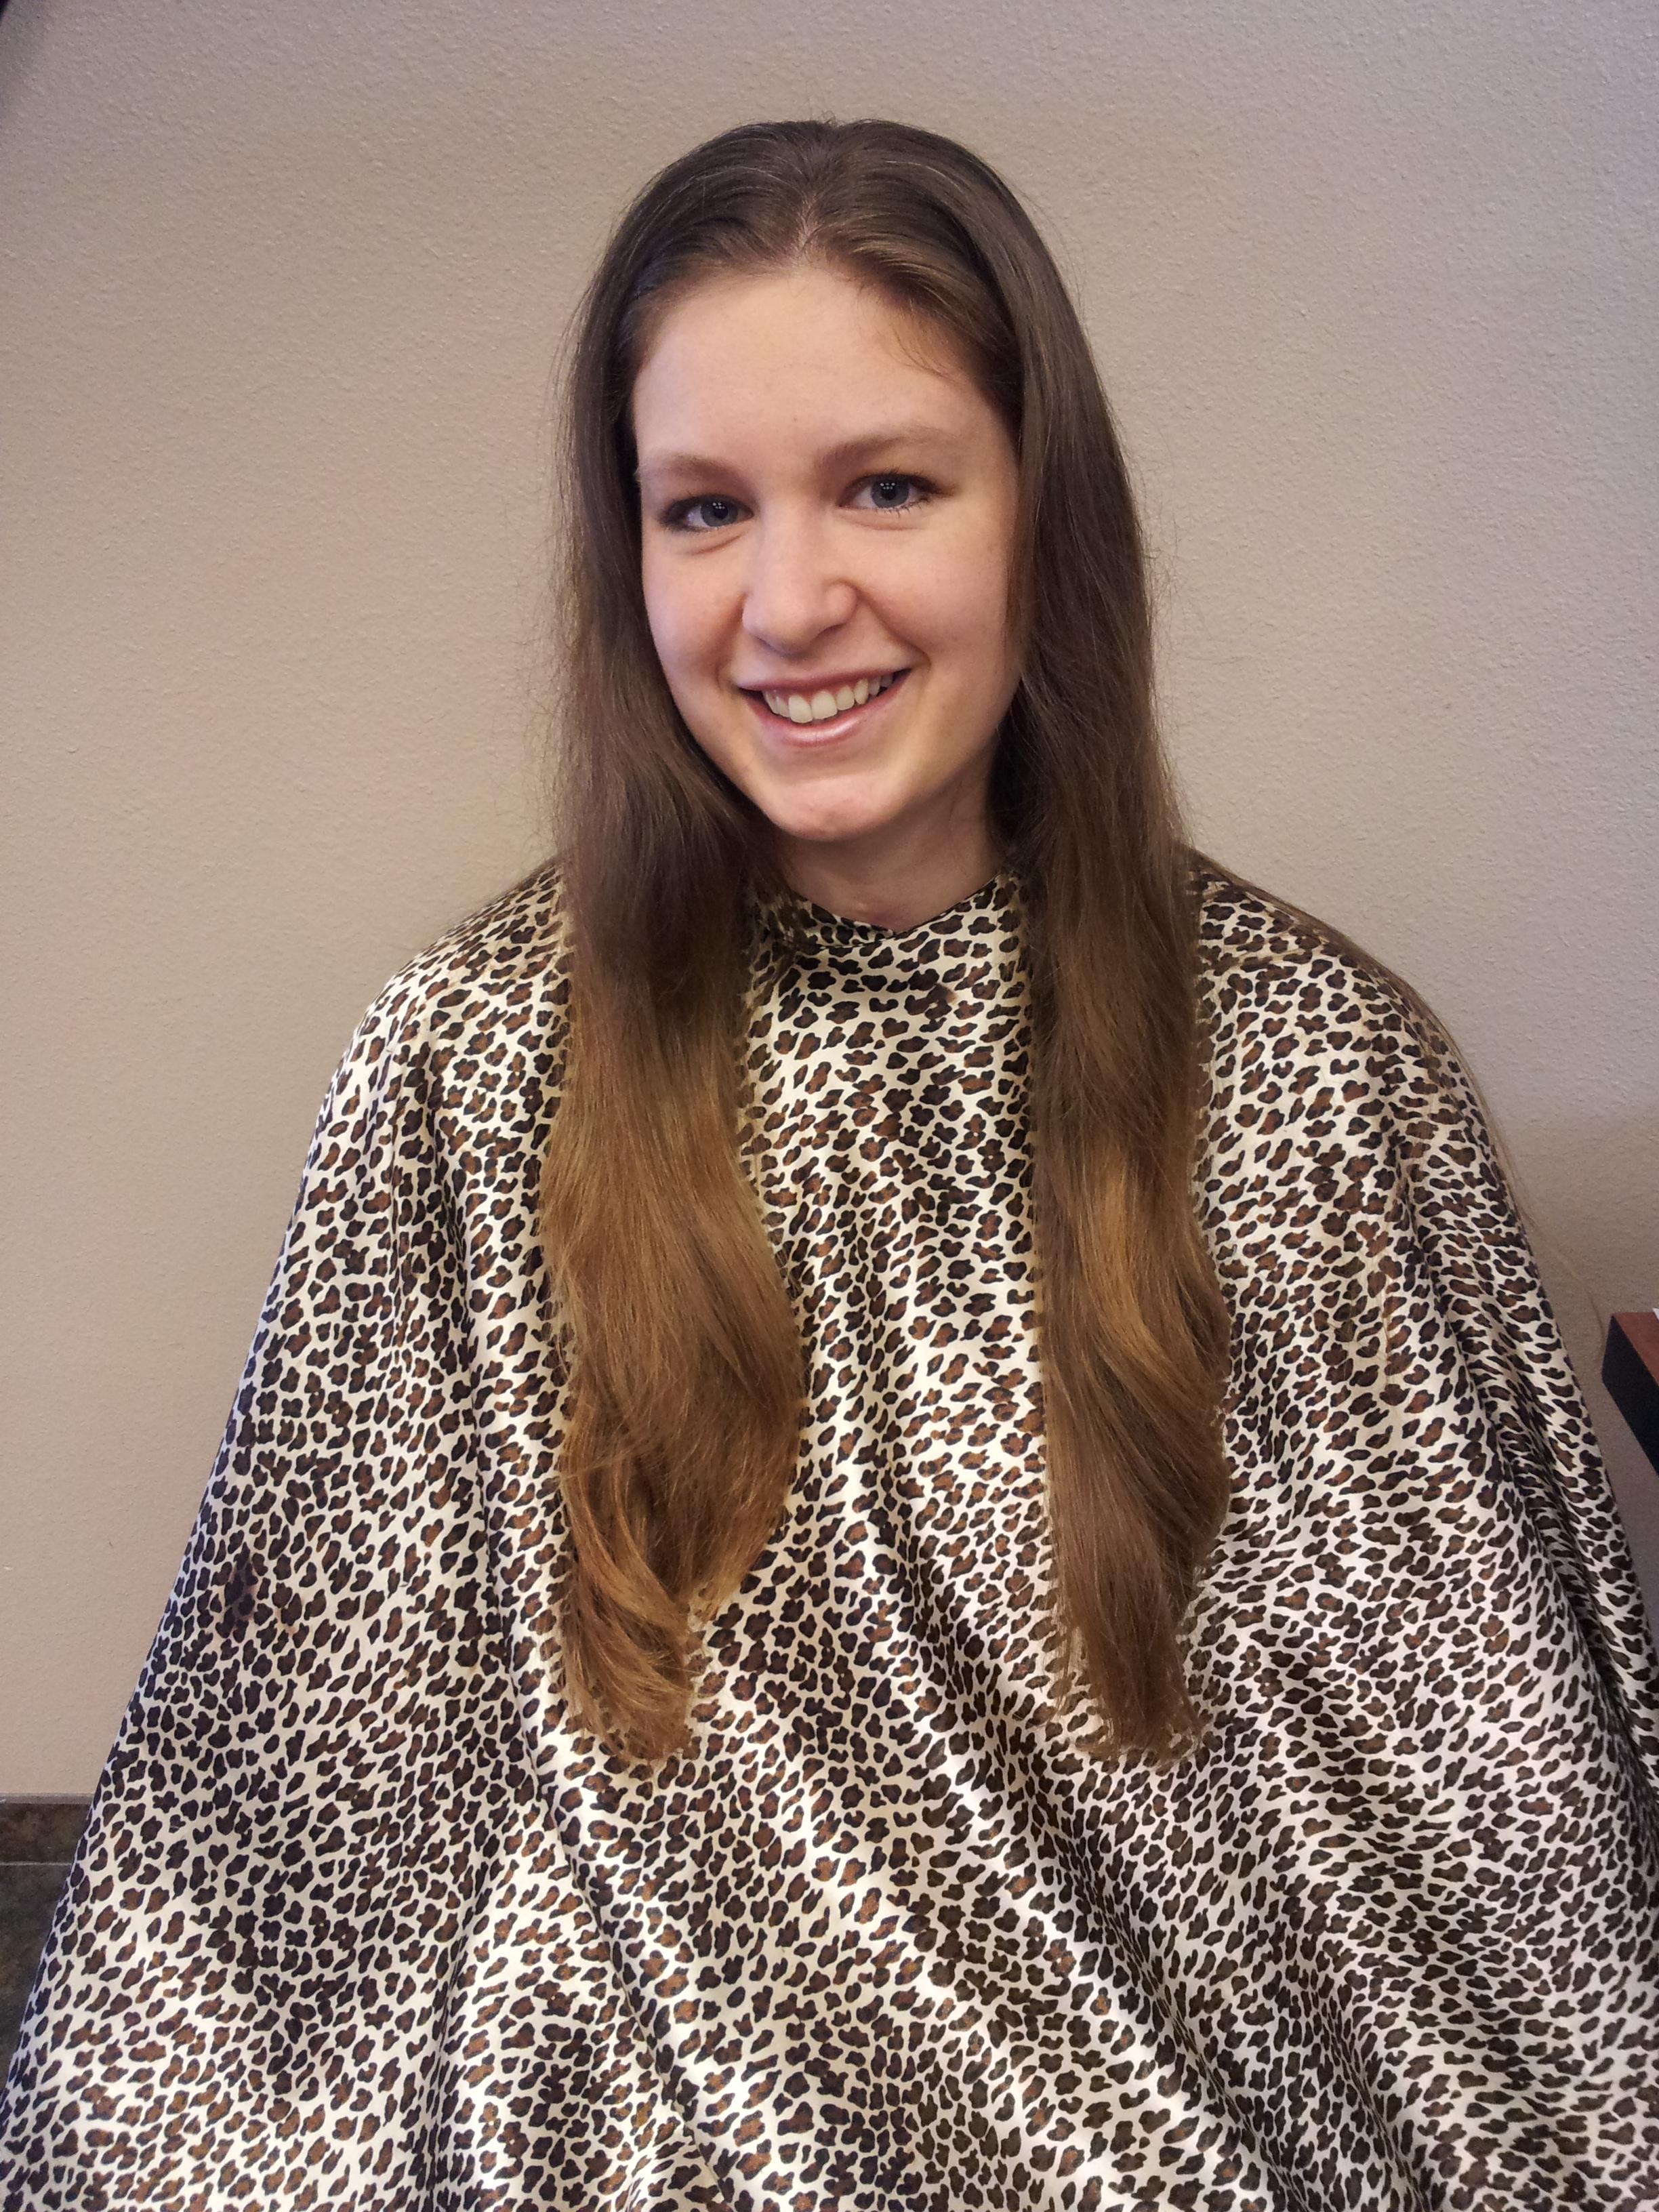 I Chopped Off My Hair With Scissors RubySongbird